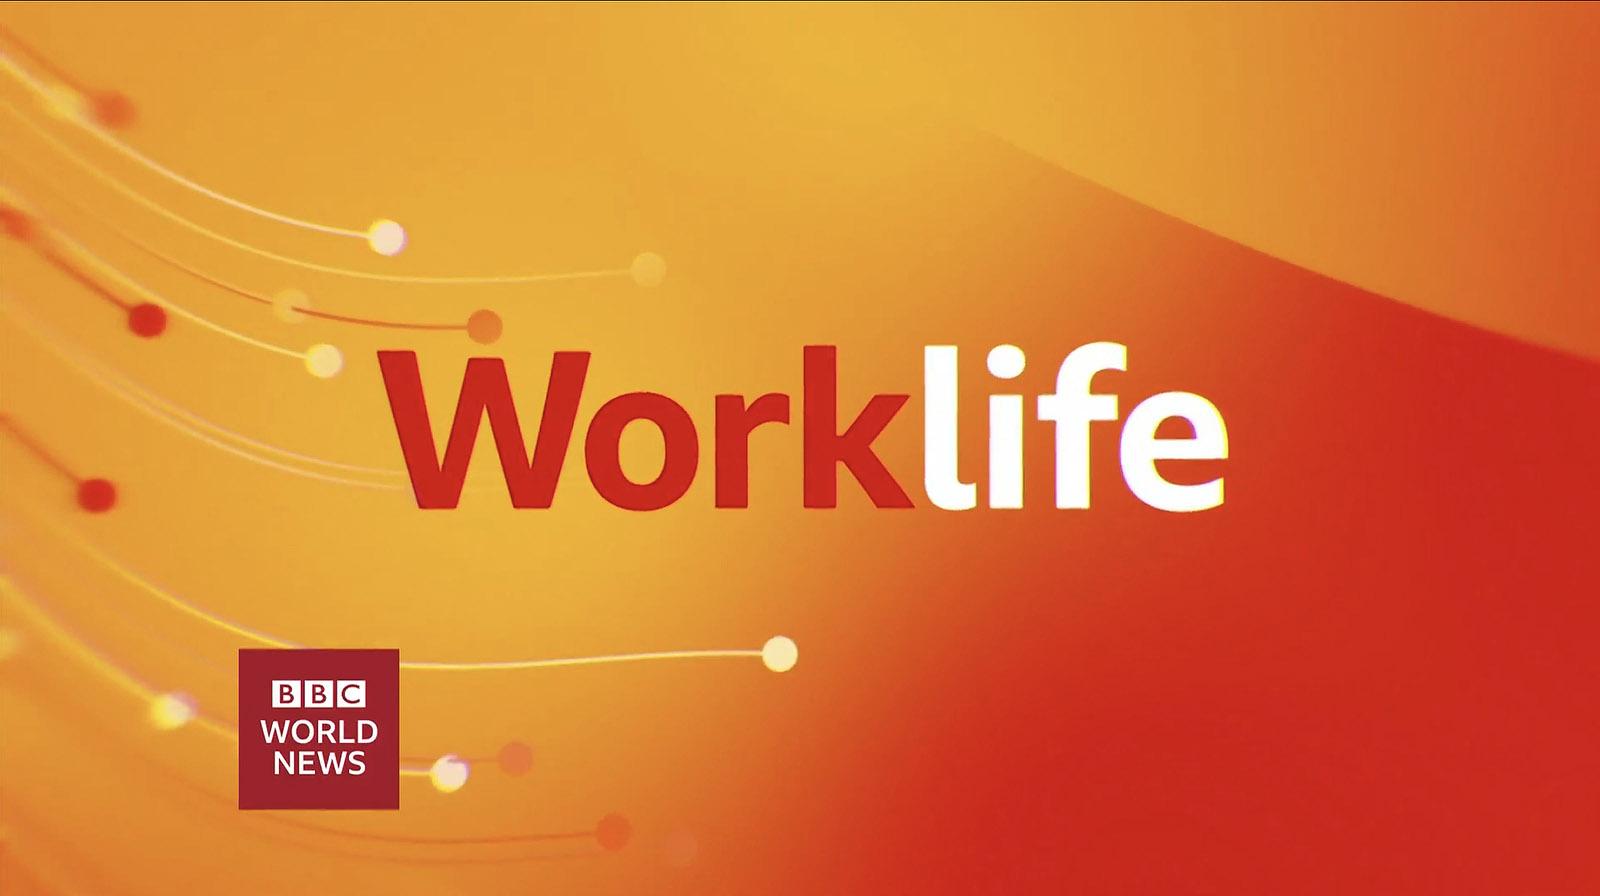 NCS_BBC-Worklife_007